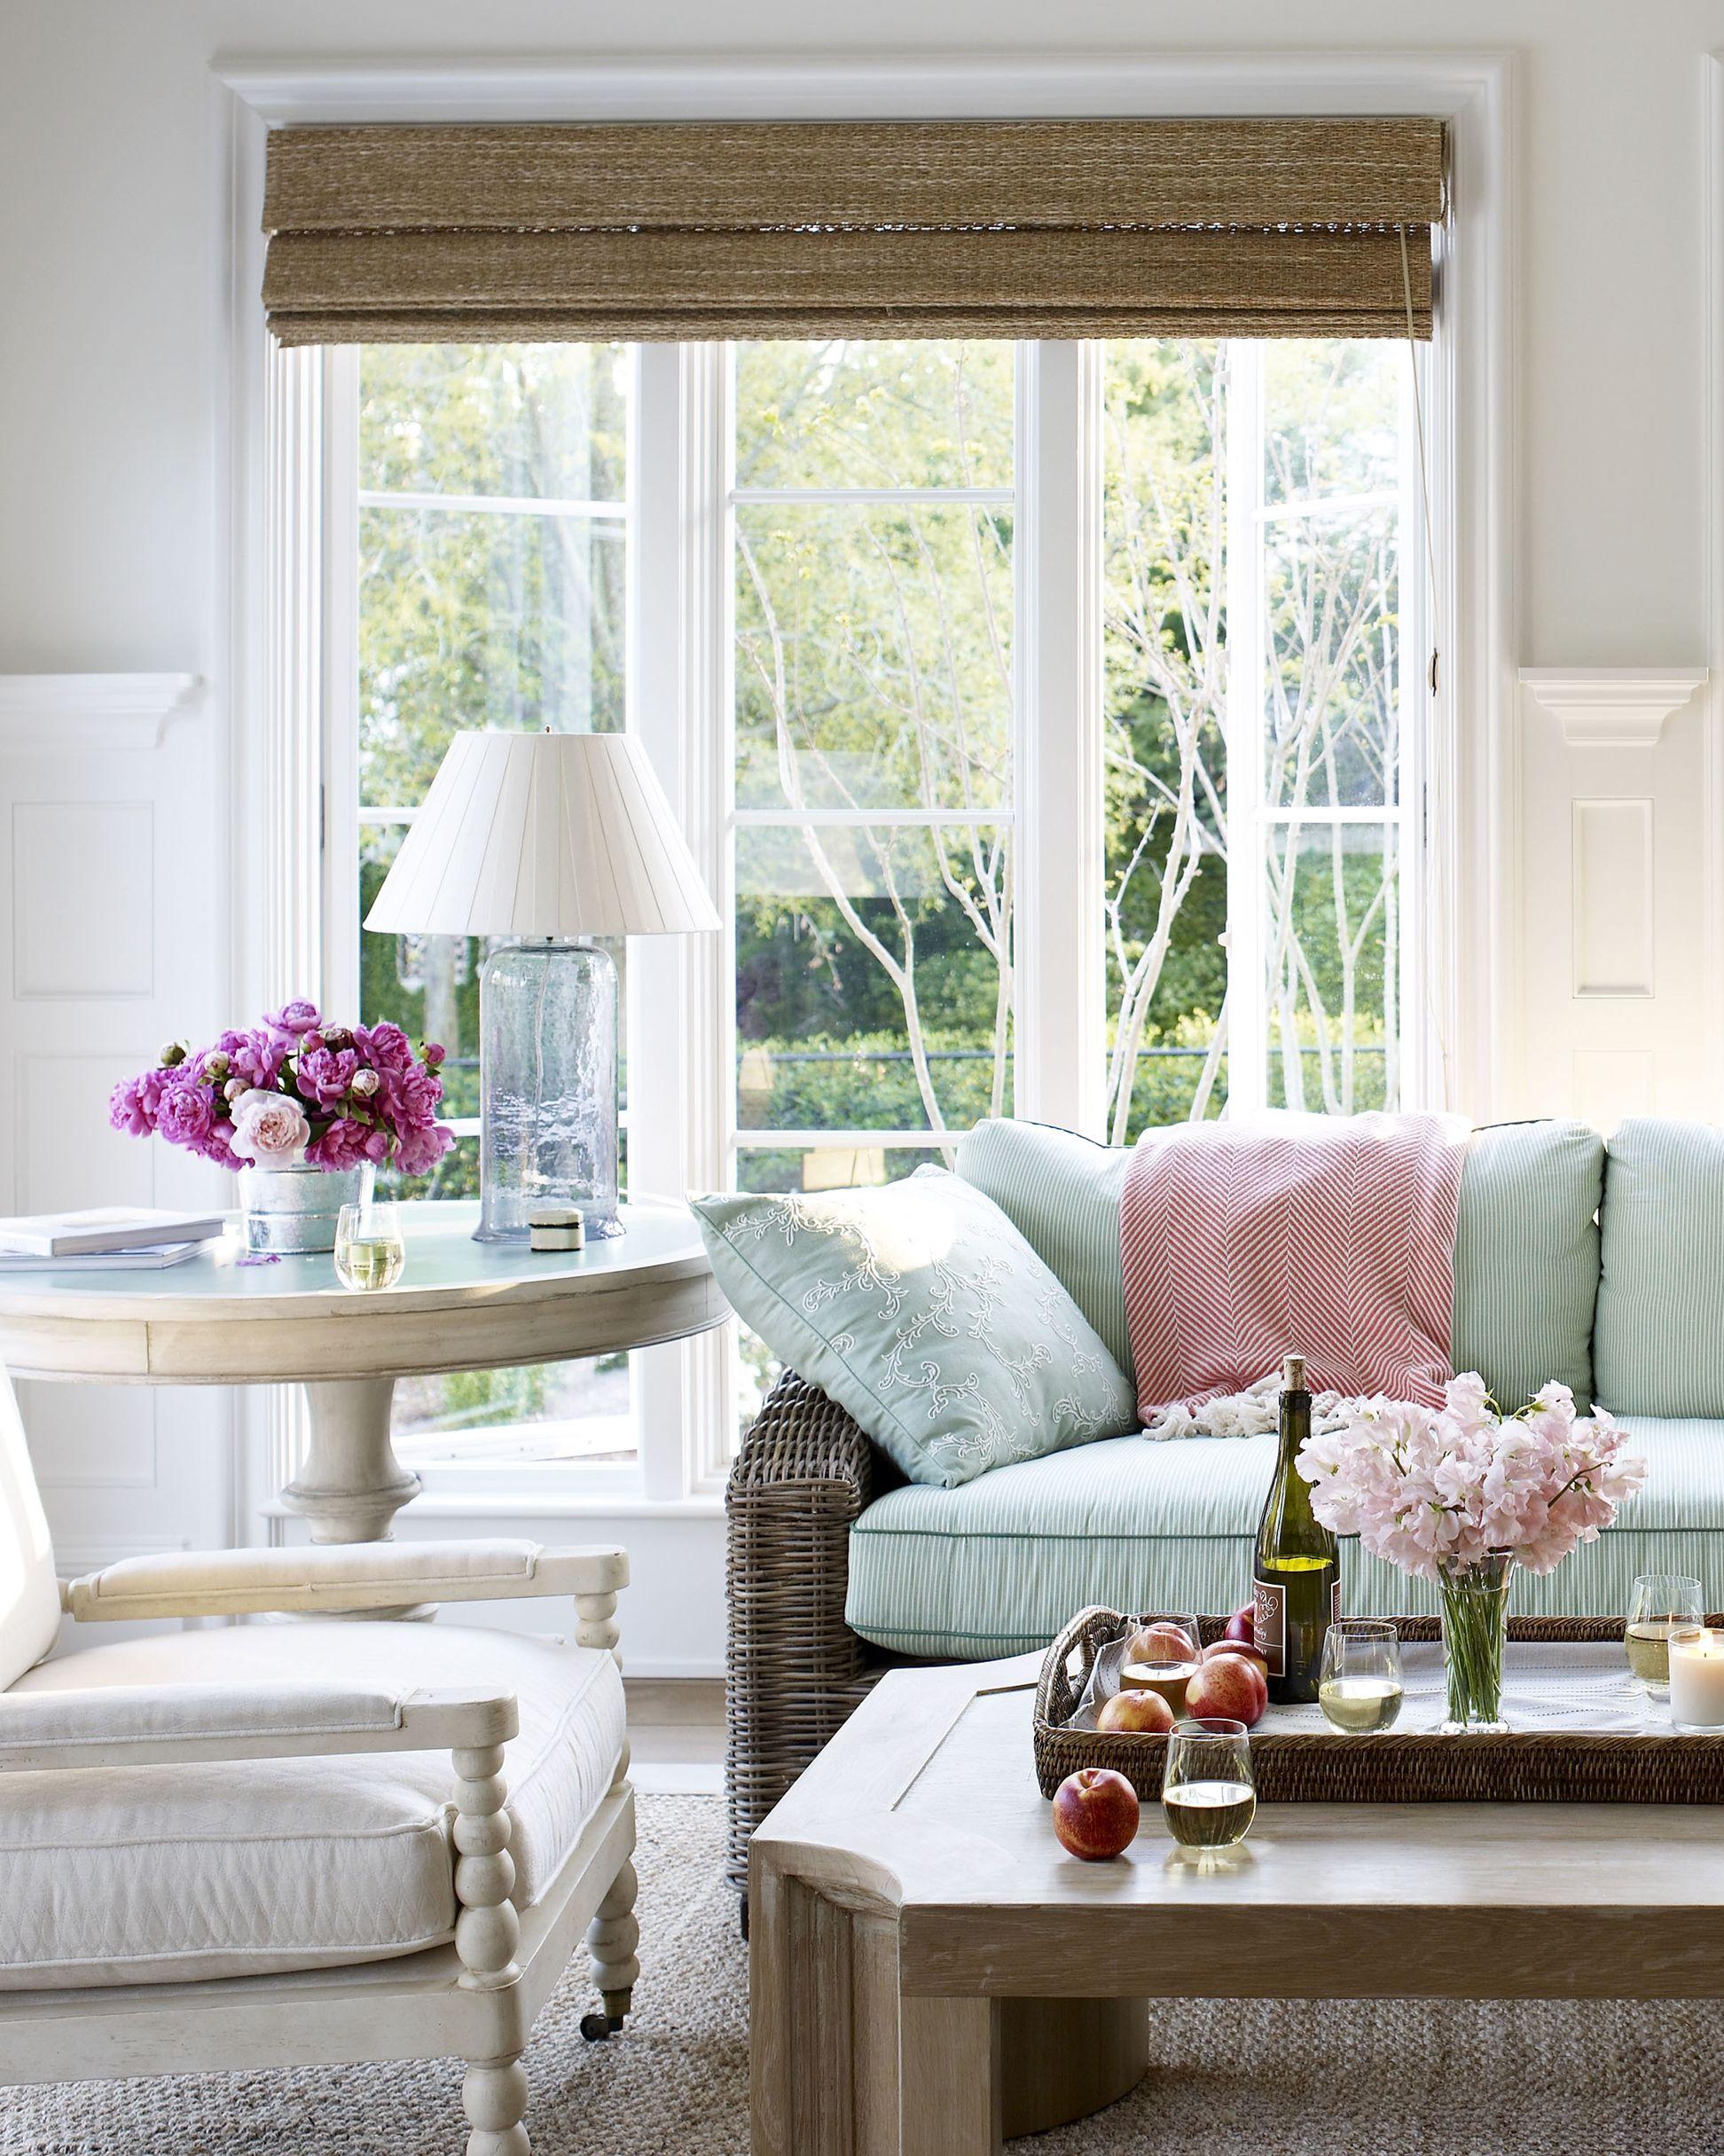 50 Stunning Sunroom Design Ideas Ultimate Home Ideas: Chic Designs & Decor For